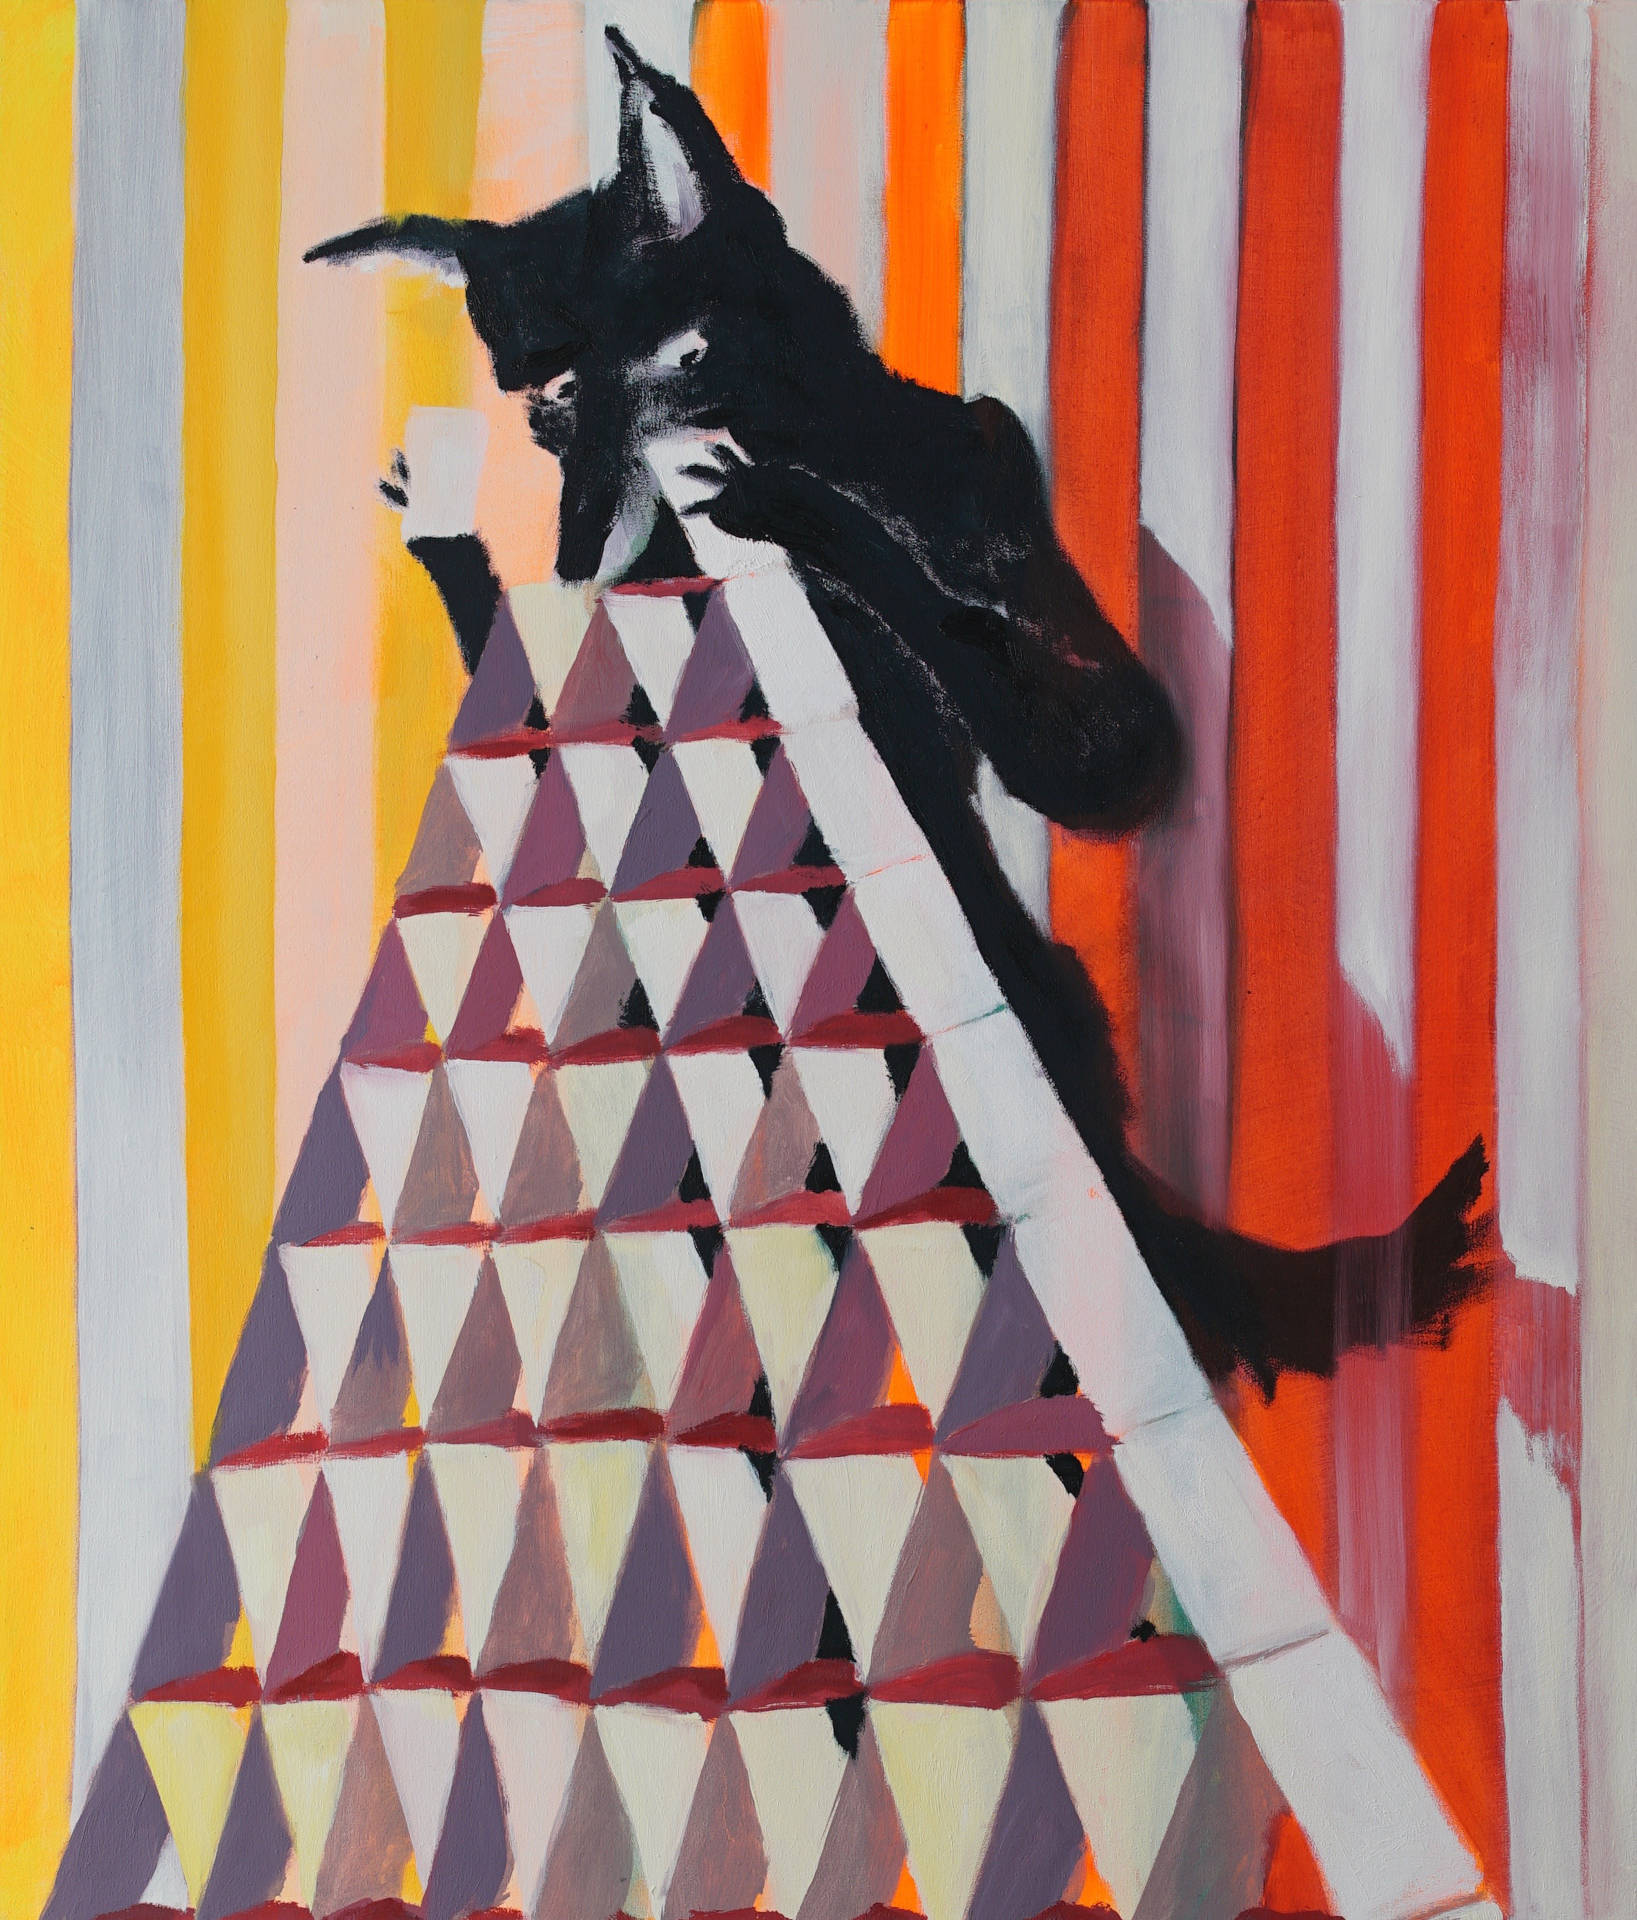 Wolf mit Kartenhaus (wolf with house of cards) by Jonas Hofrichter, 2015